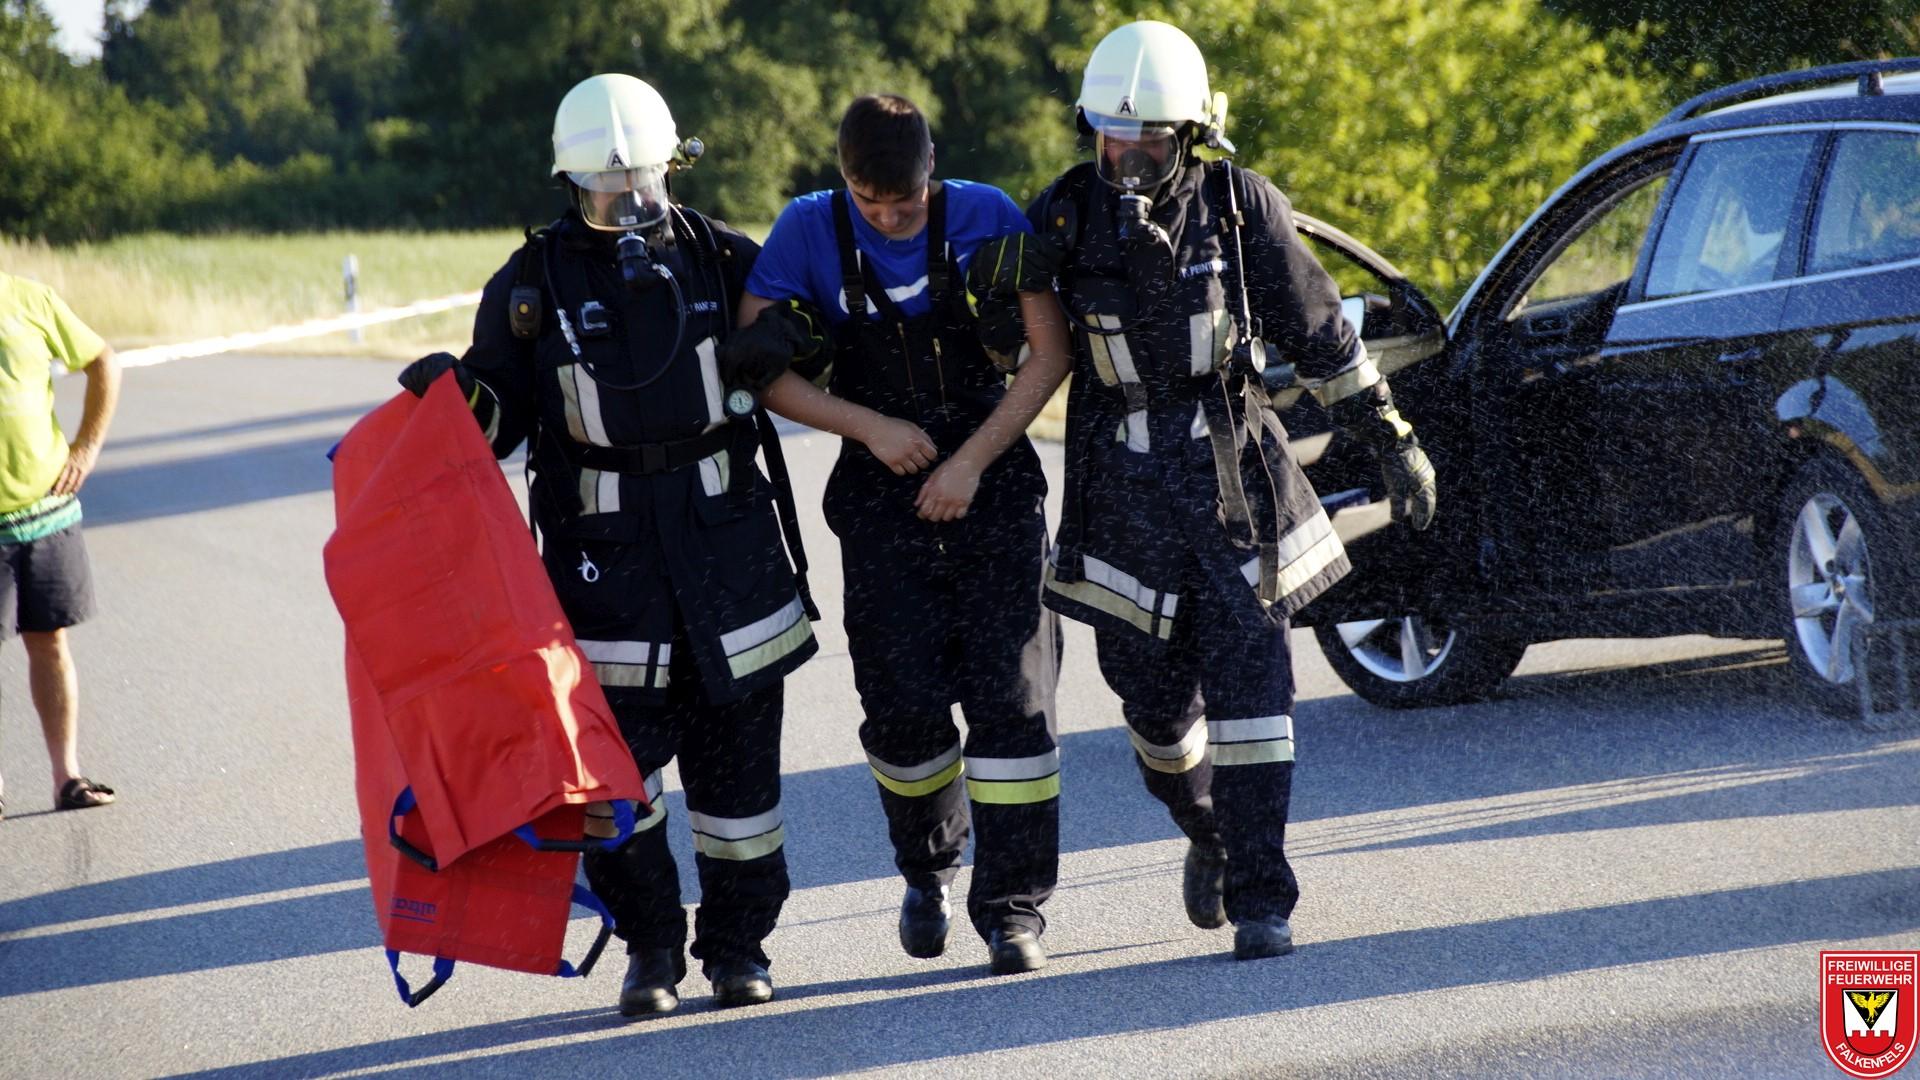 Rettung des Unfallfahrers